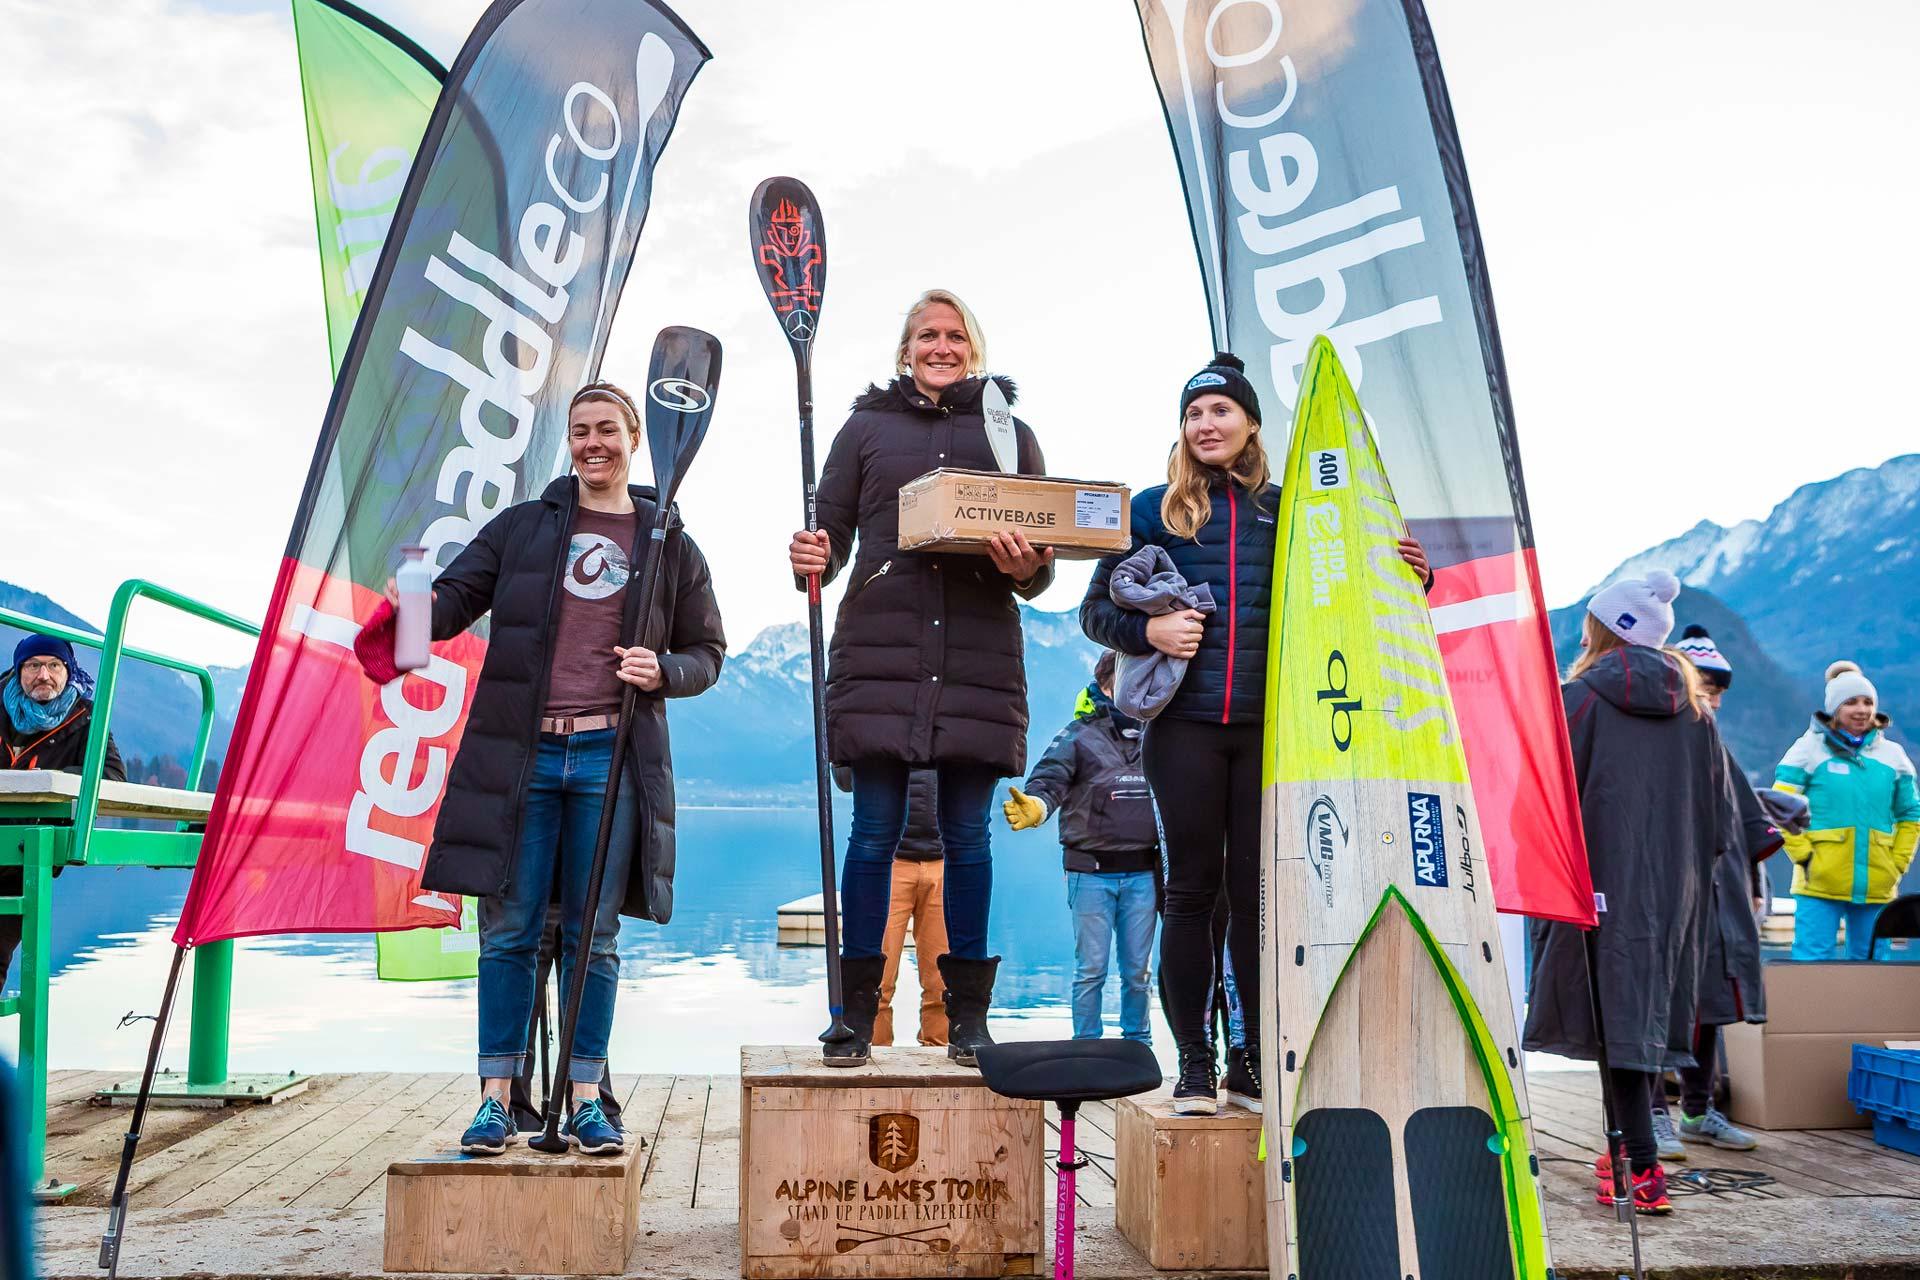 Sonni-Hoenscheid-Wins-2019-Gla-Gla-Race-womens-podium